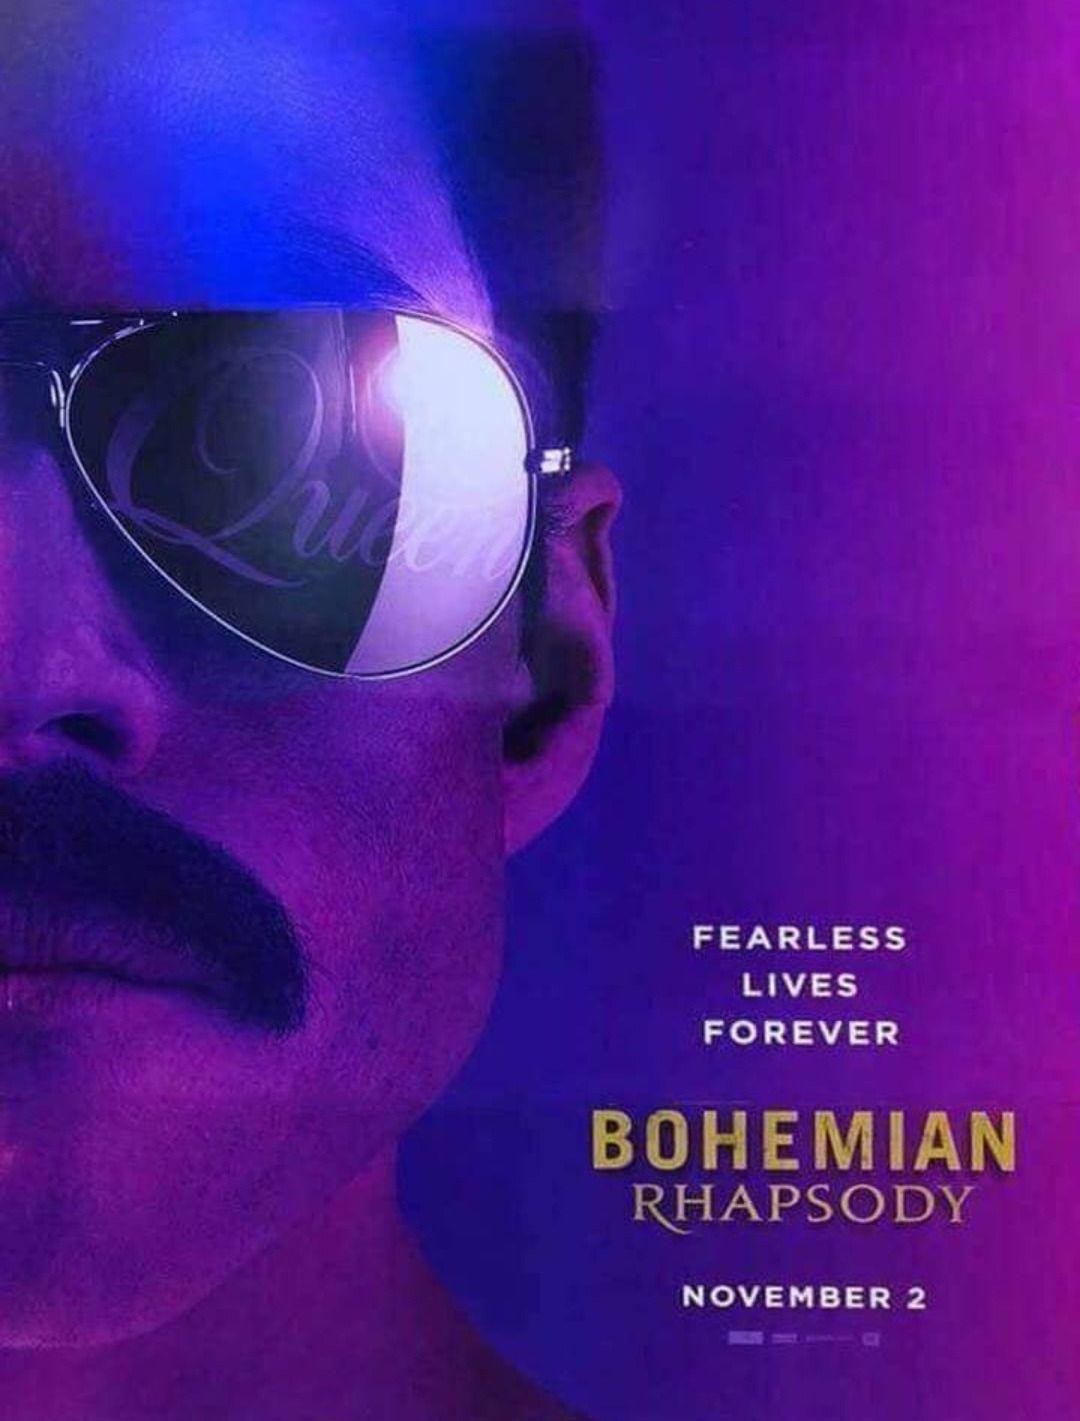 Bohemian Rhapsody Movie Poster Bohemian Rhapsody Full Movies Online Free Full Movies